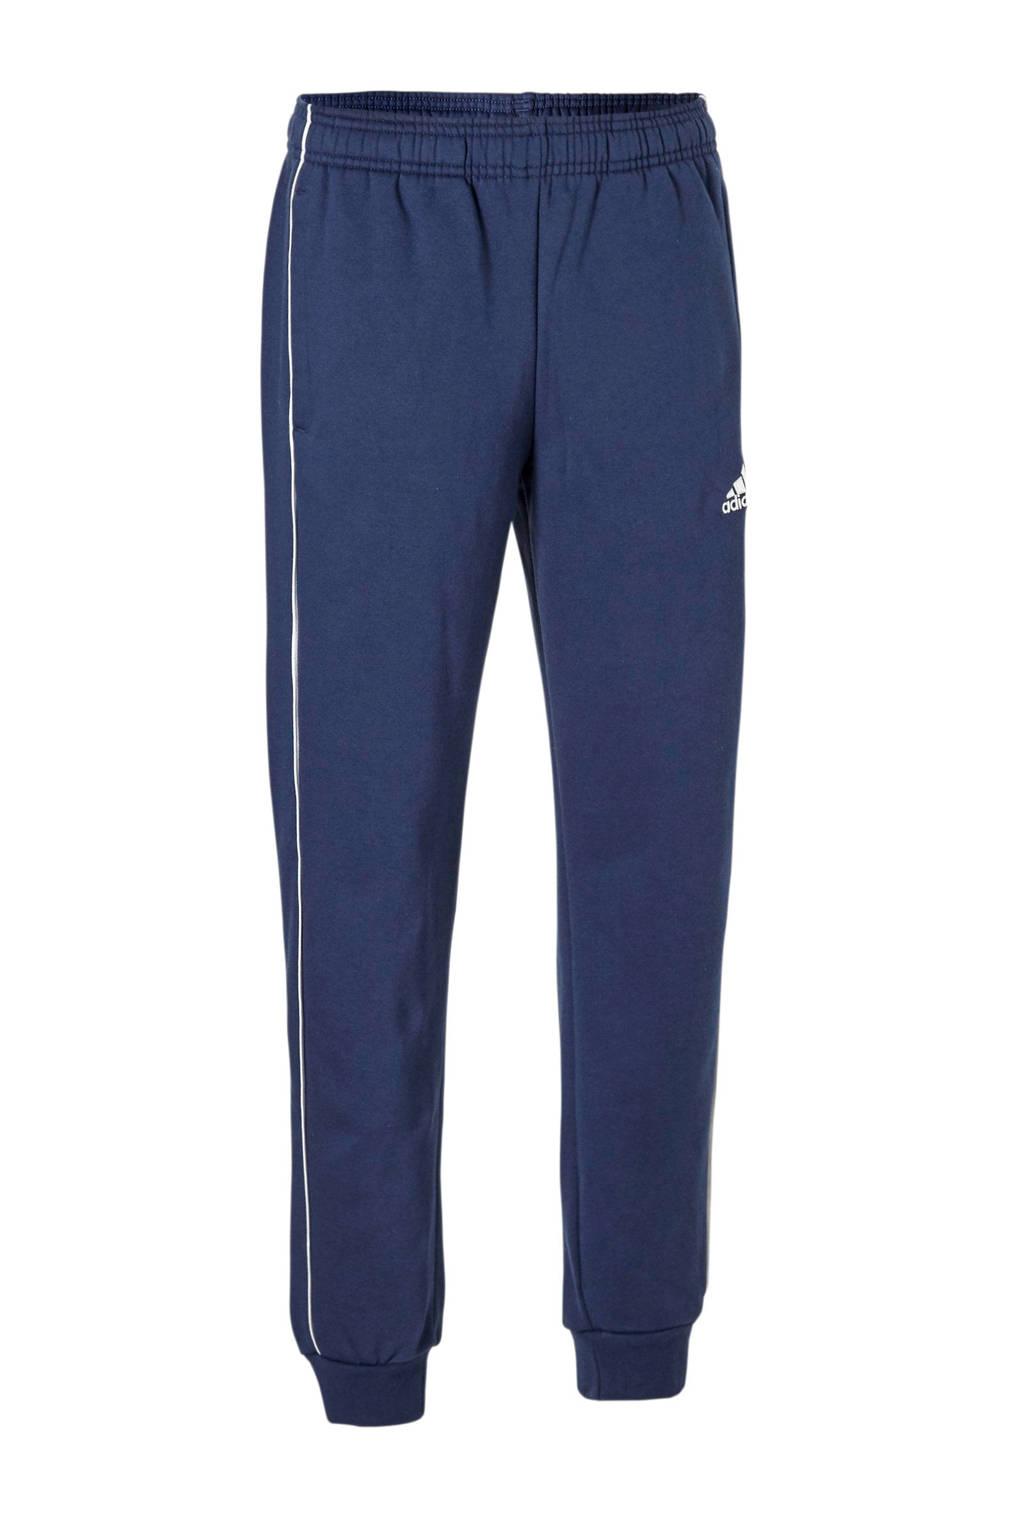 adidas performance   joggingbroek donkerblauw, Donkerblauw/wit